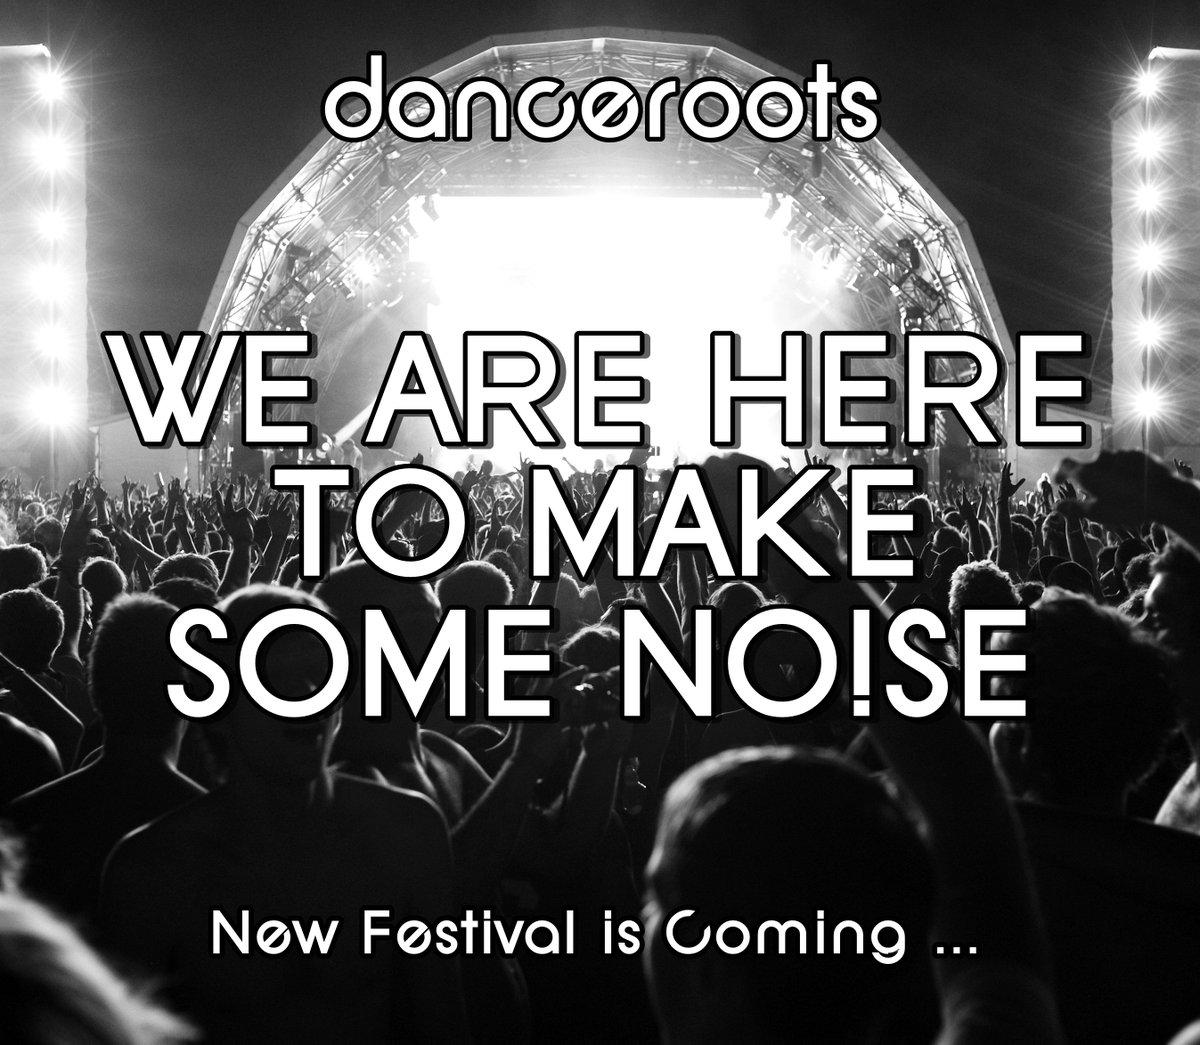 NEW FESTIVAL IS COMING ! #Durango  @DancerootsDjs / Coming Soon !  #festival #Djset #electronicmusic #Djlife #Techno #Trance #Hardstyle #HouseMusic #EDM #Dubstep #Dgo #MSN #LaNetaMeGusta #Soon<br>http://pic.twitter.com/xocv94dbH5